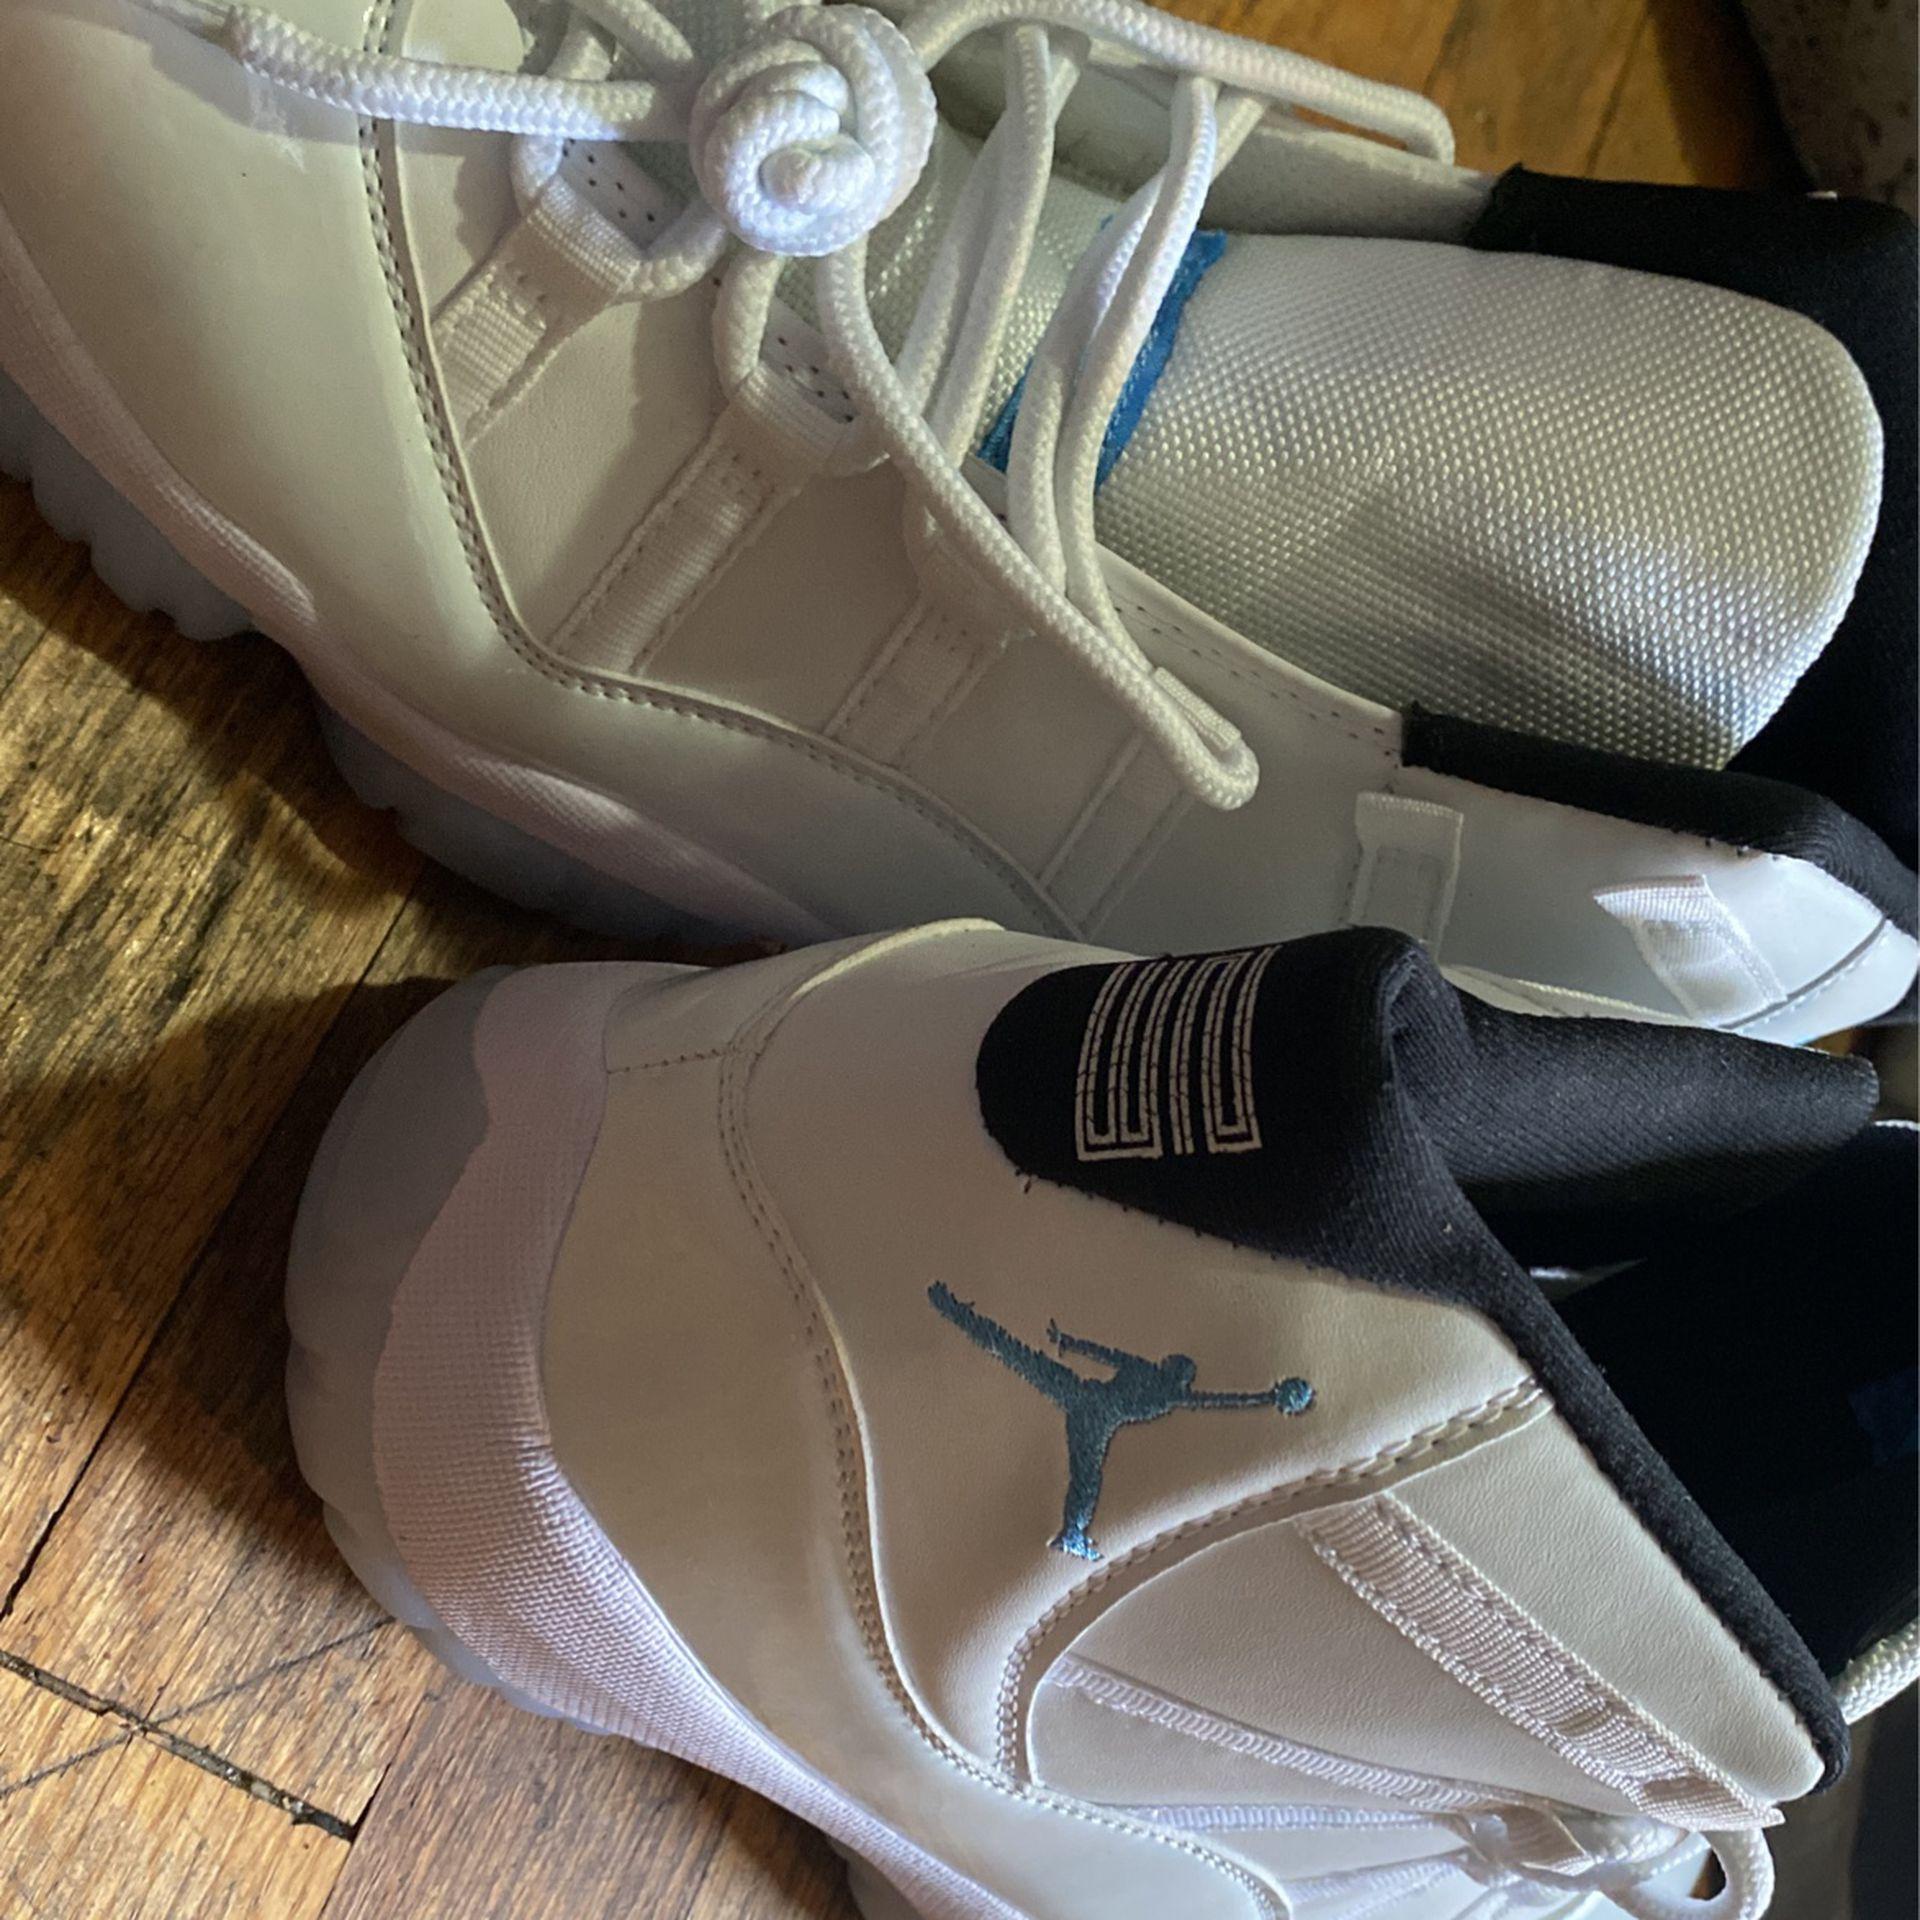 Jordan 11 Retro Legend Blue's (2014)